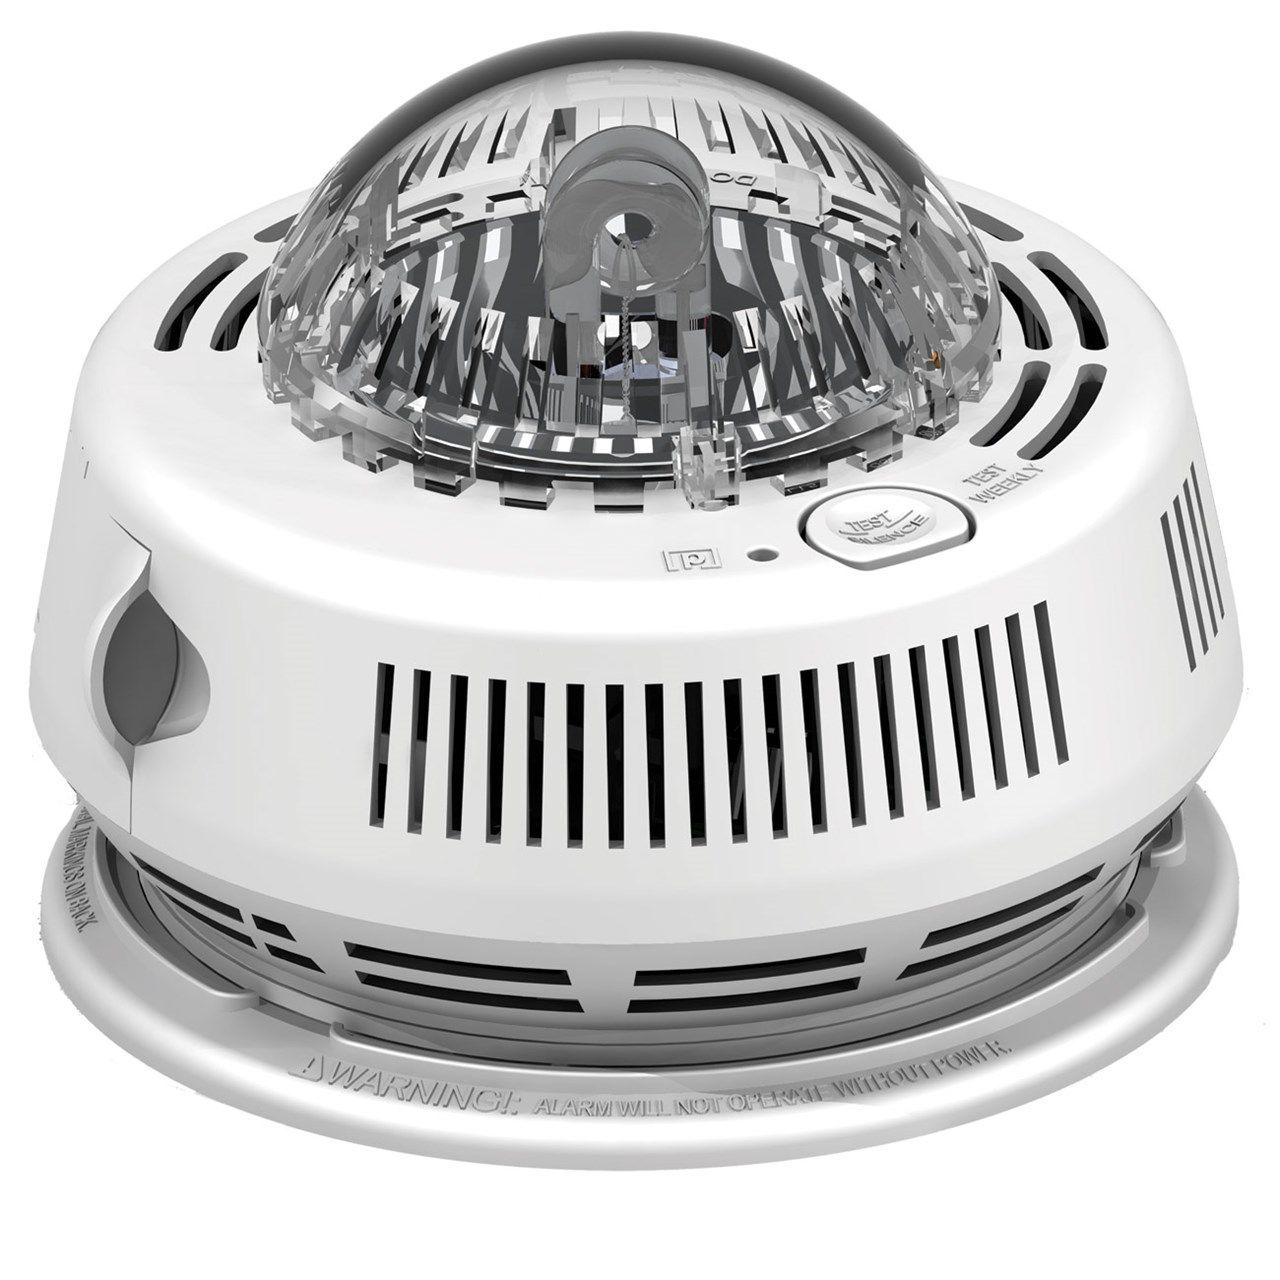 First Alert Smoke Alarm With Led Strobe Light For The Hearing Impaired Smoke Alarms Strobe Lights Motion Sensor Lights Outdoor